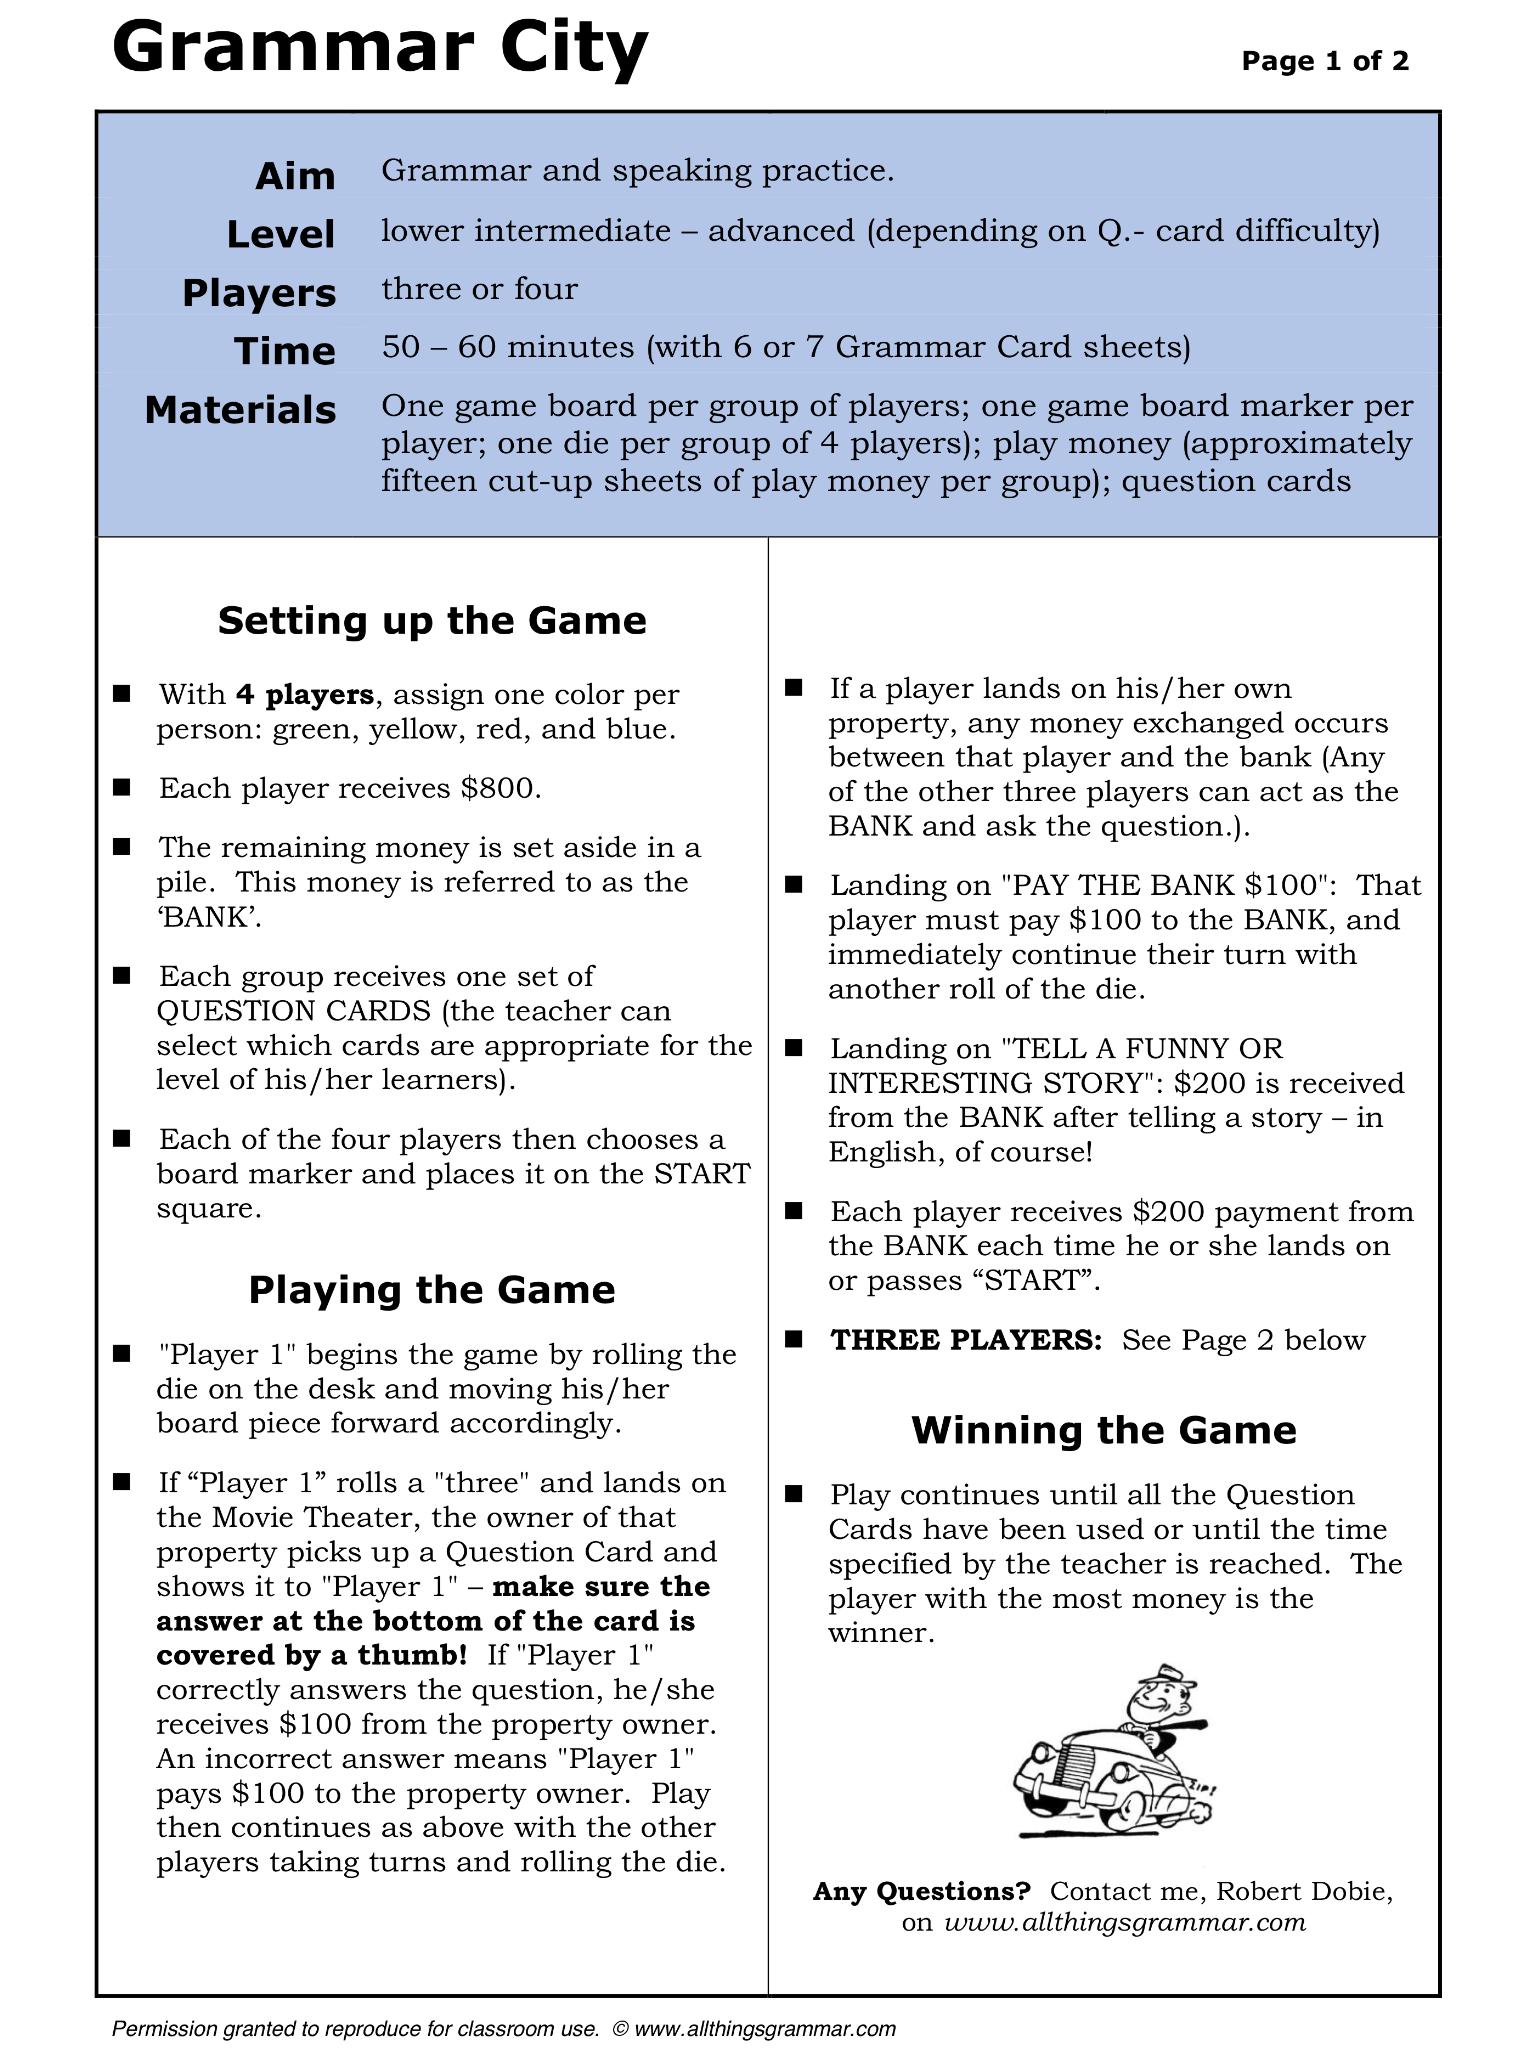 English Grammar City Board Game http://www.allthingsgrammar.com/grammar